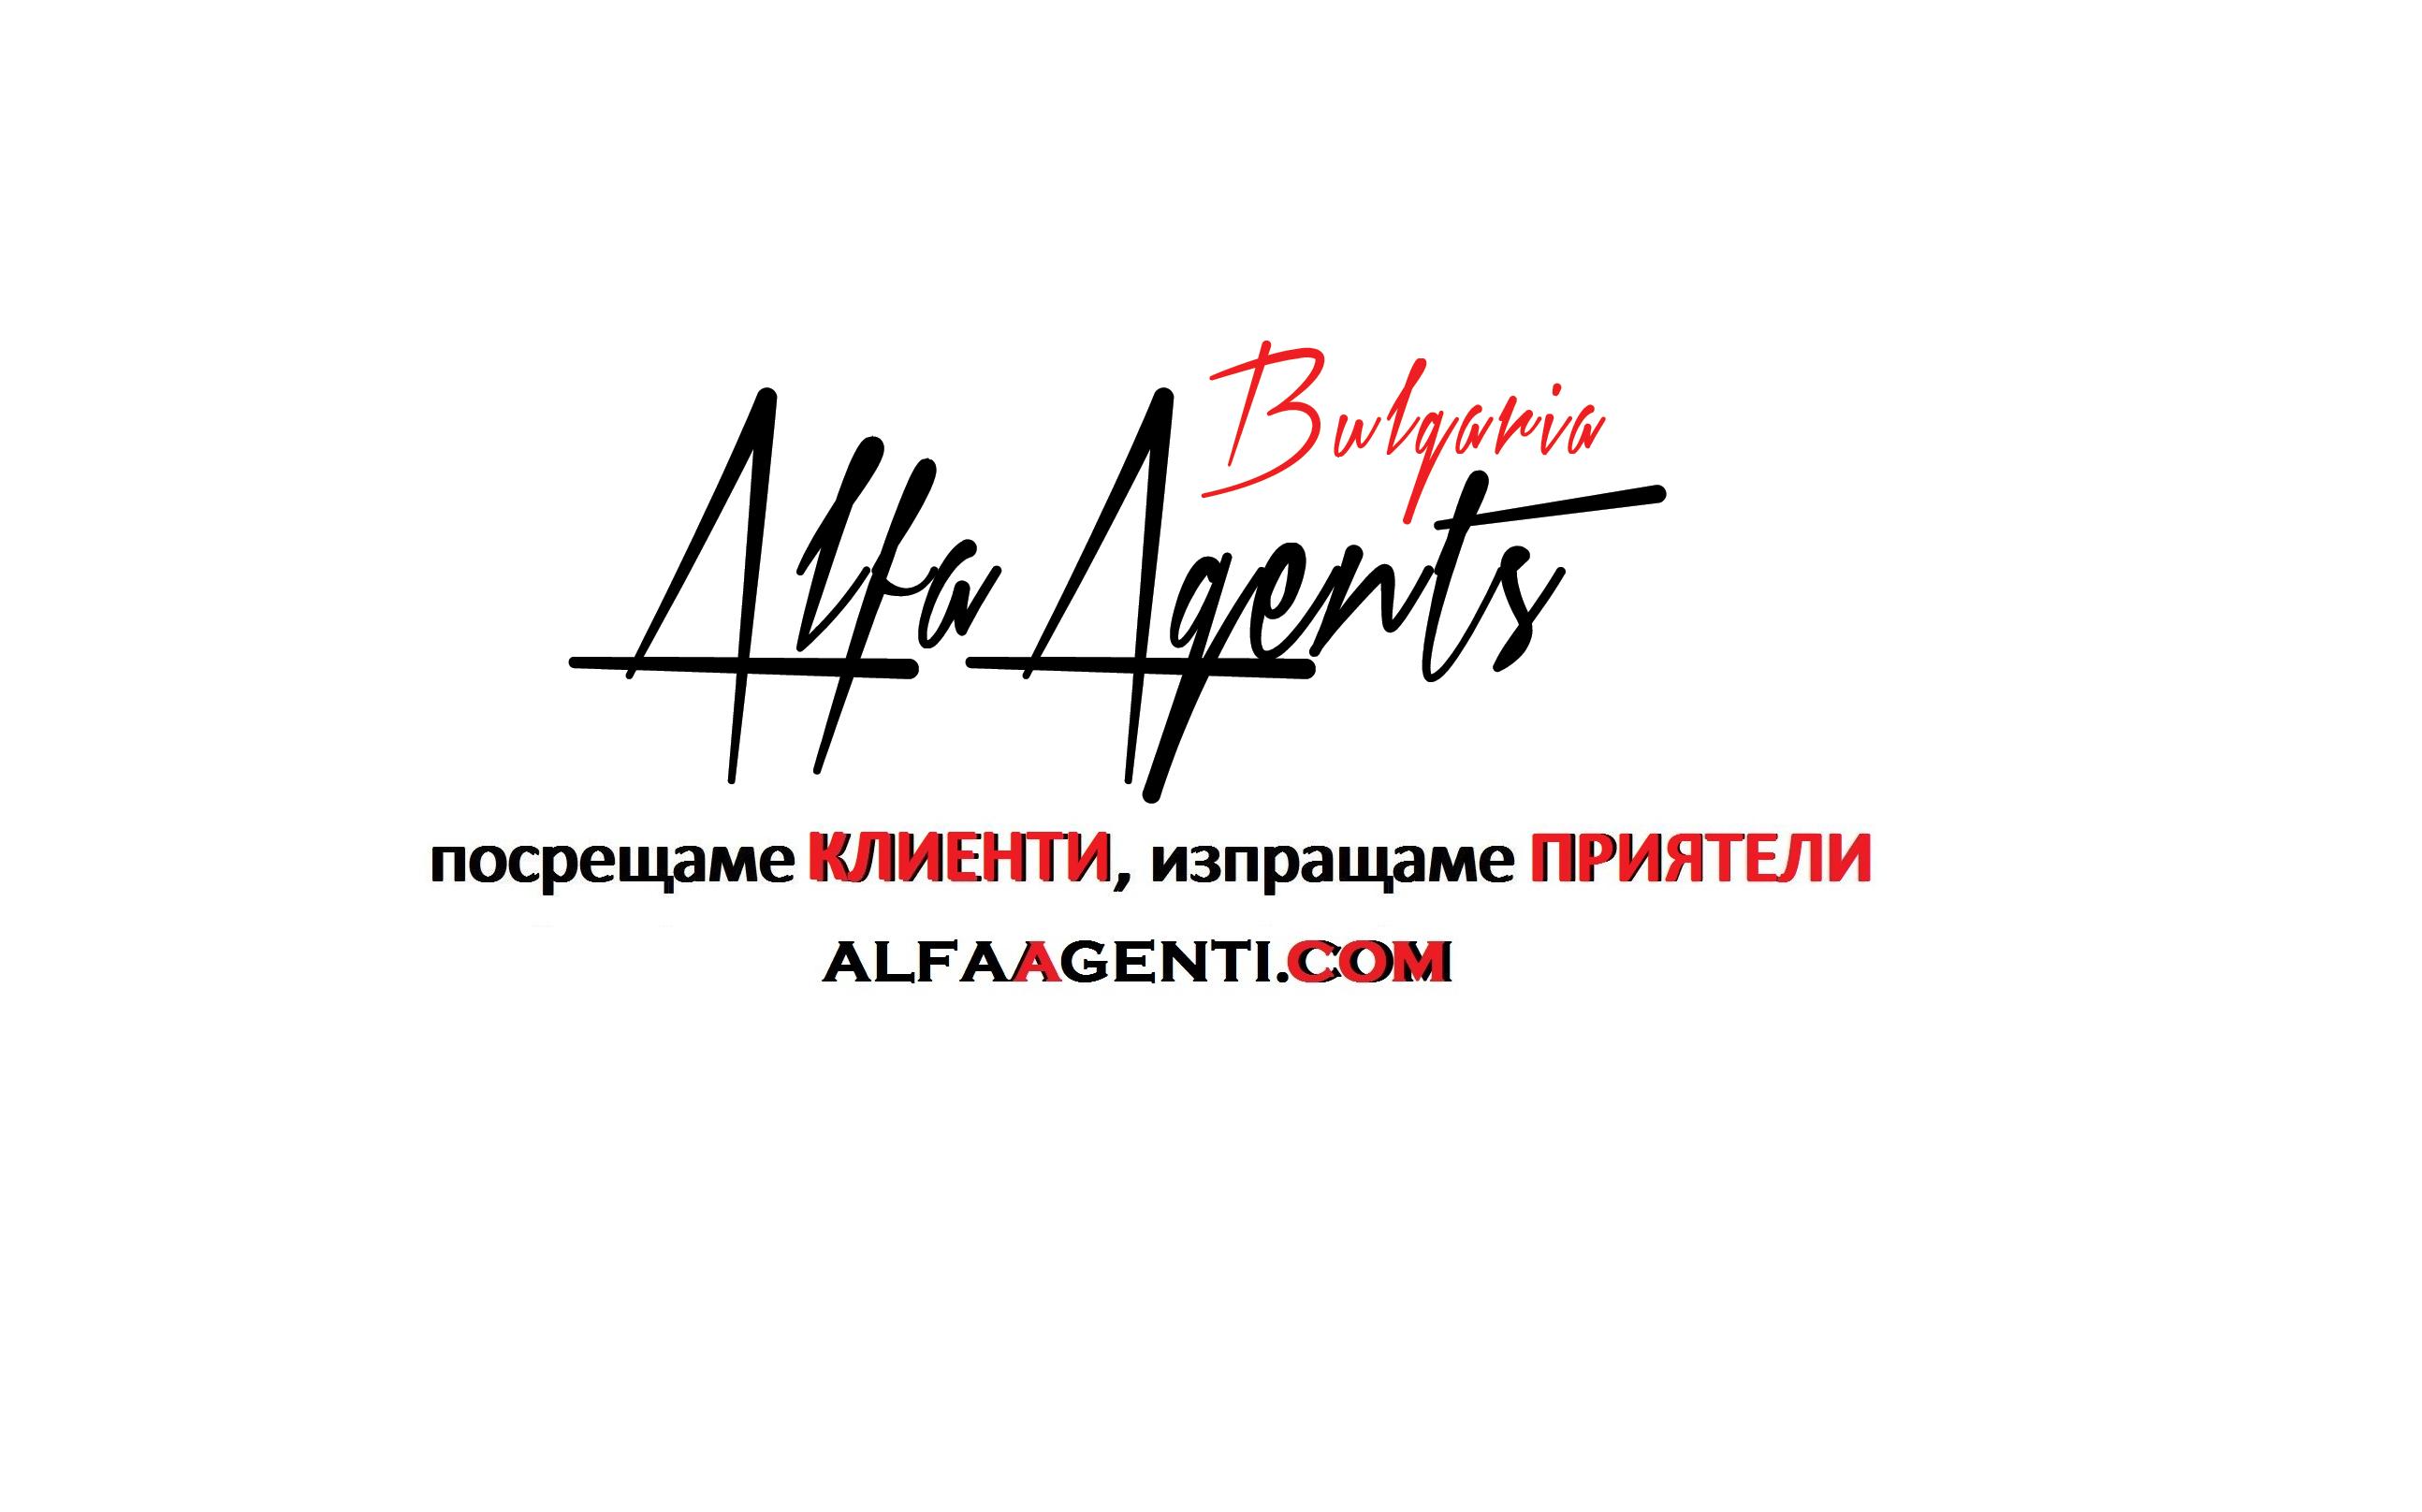 Алфа агенти оригинал ЕООД